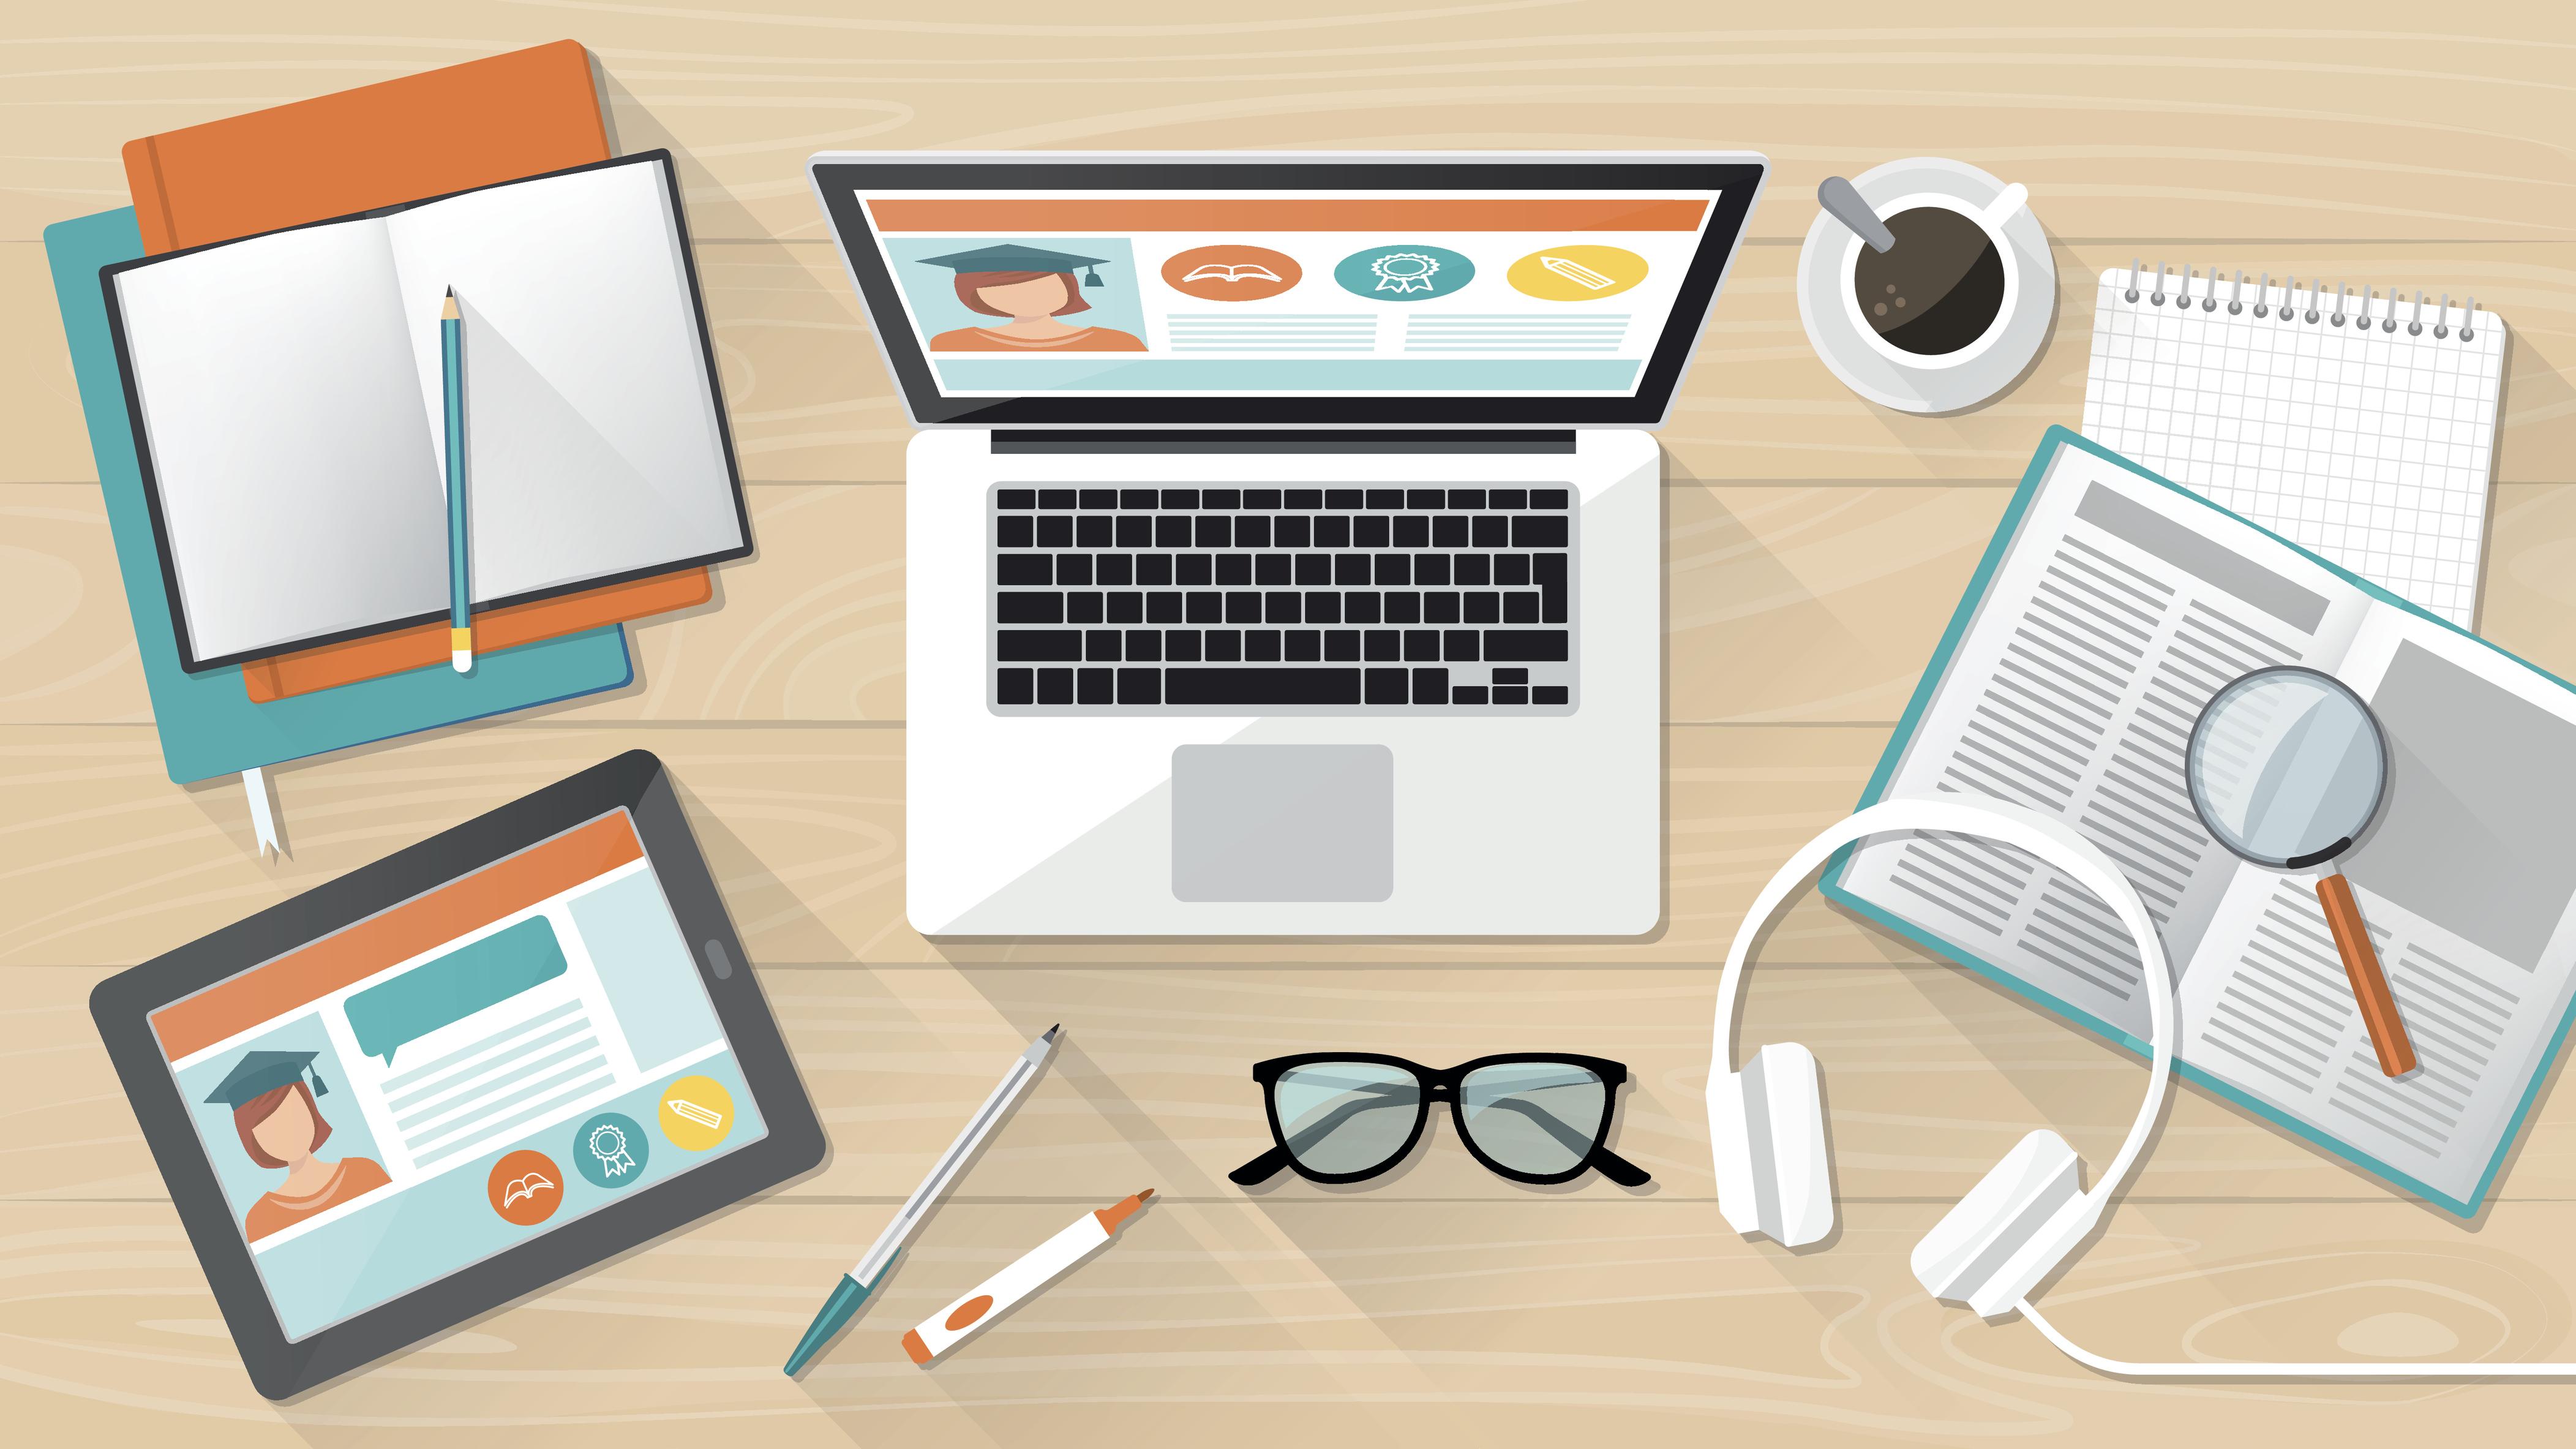 How Does Digital Marketing Work?